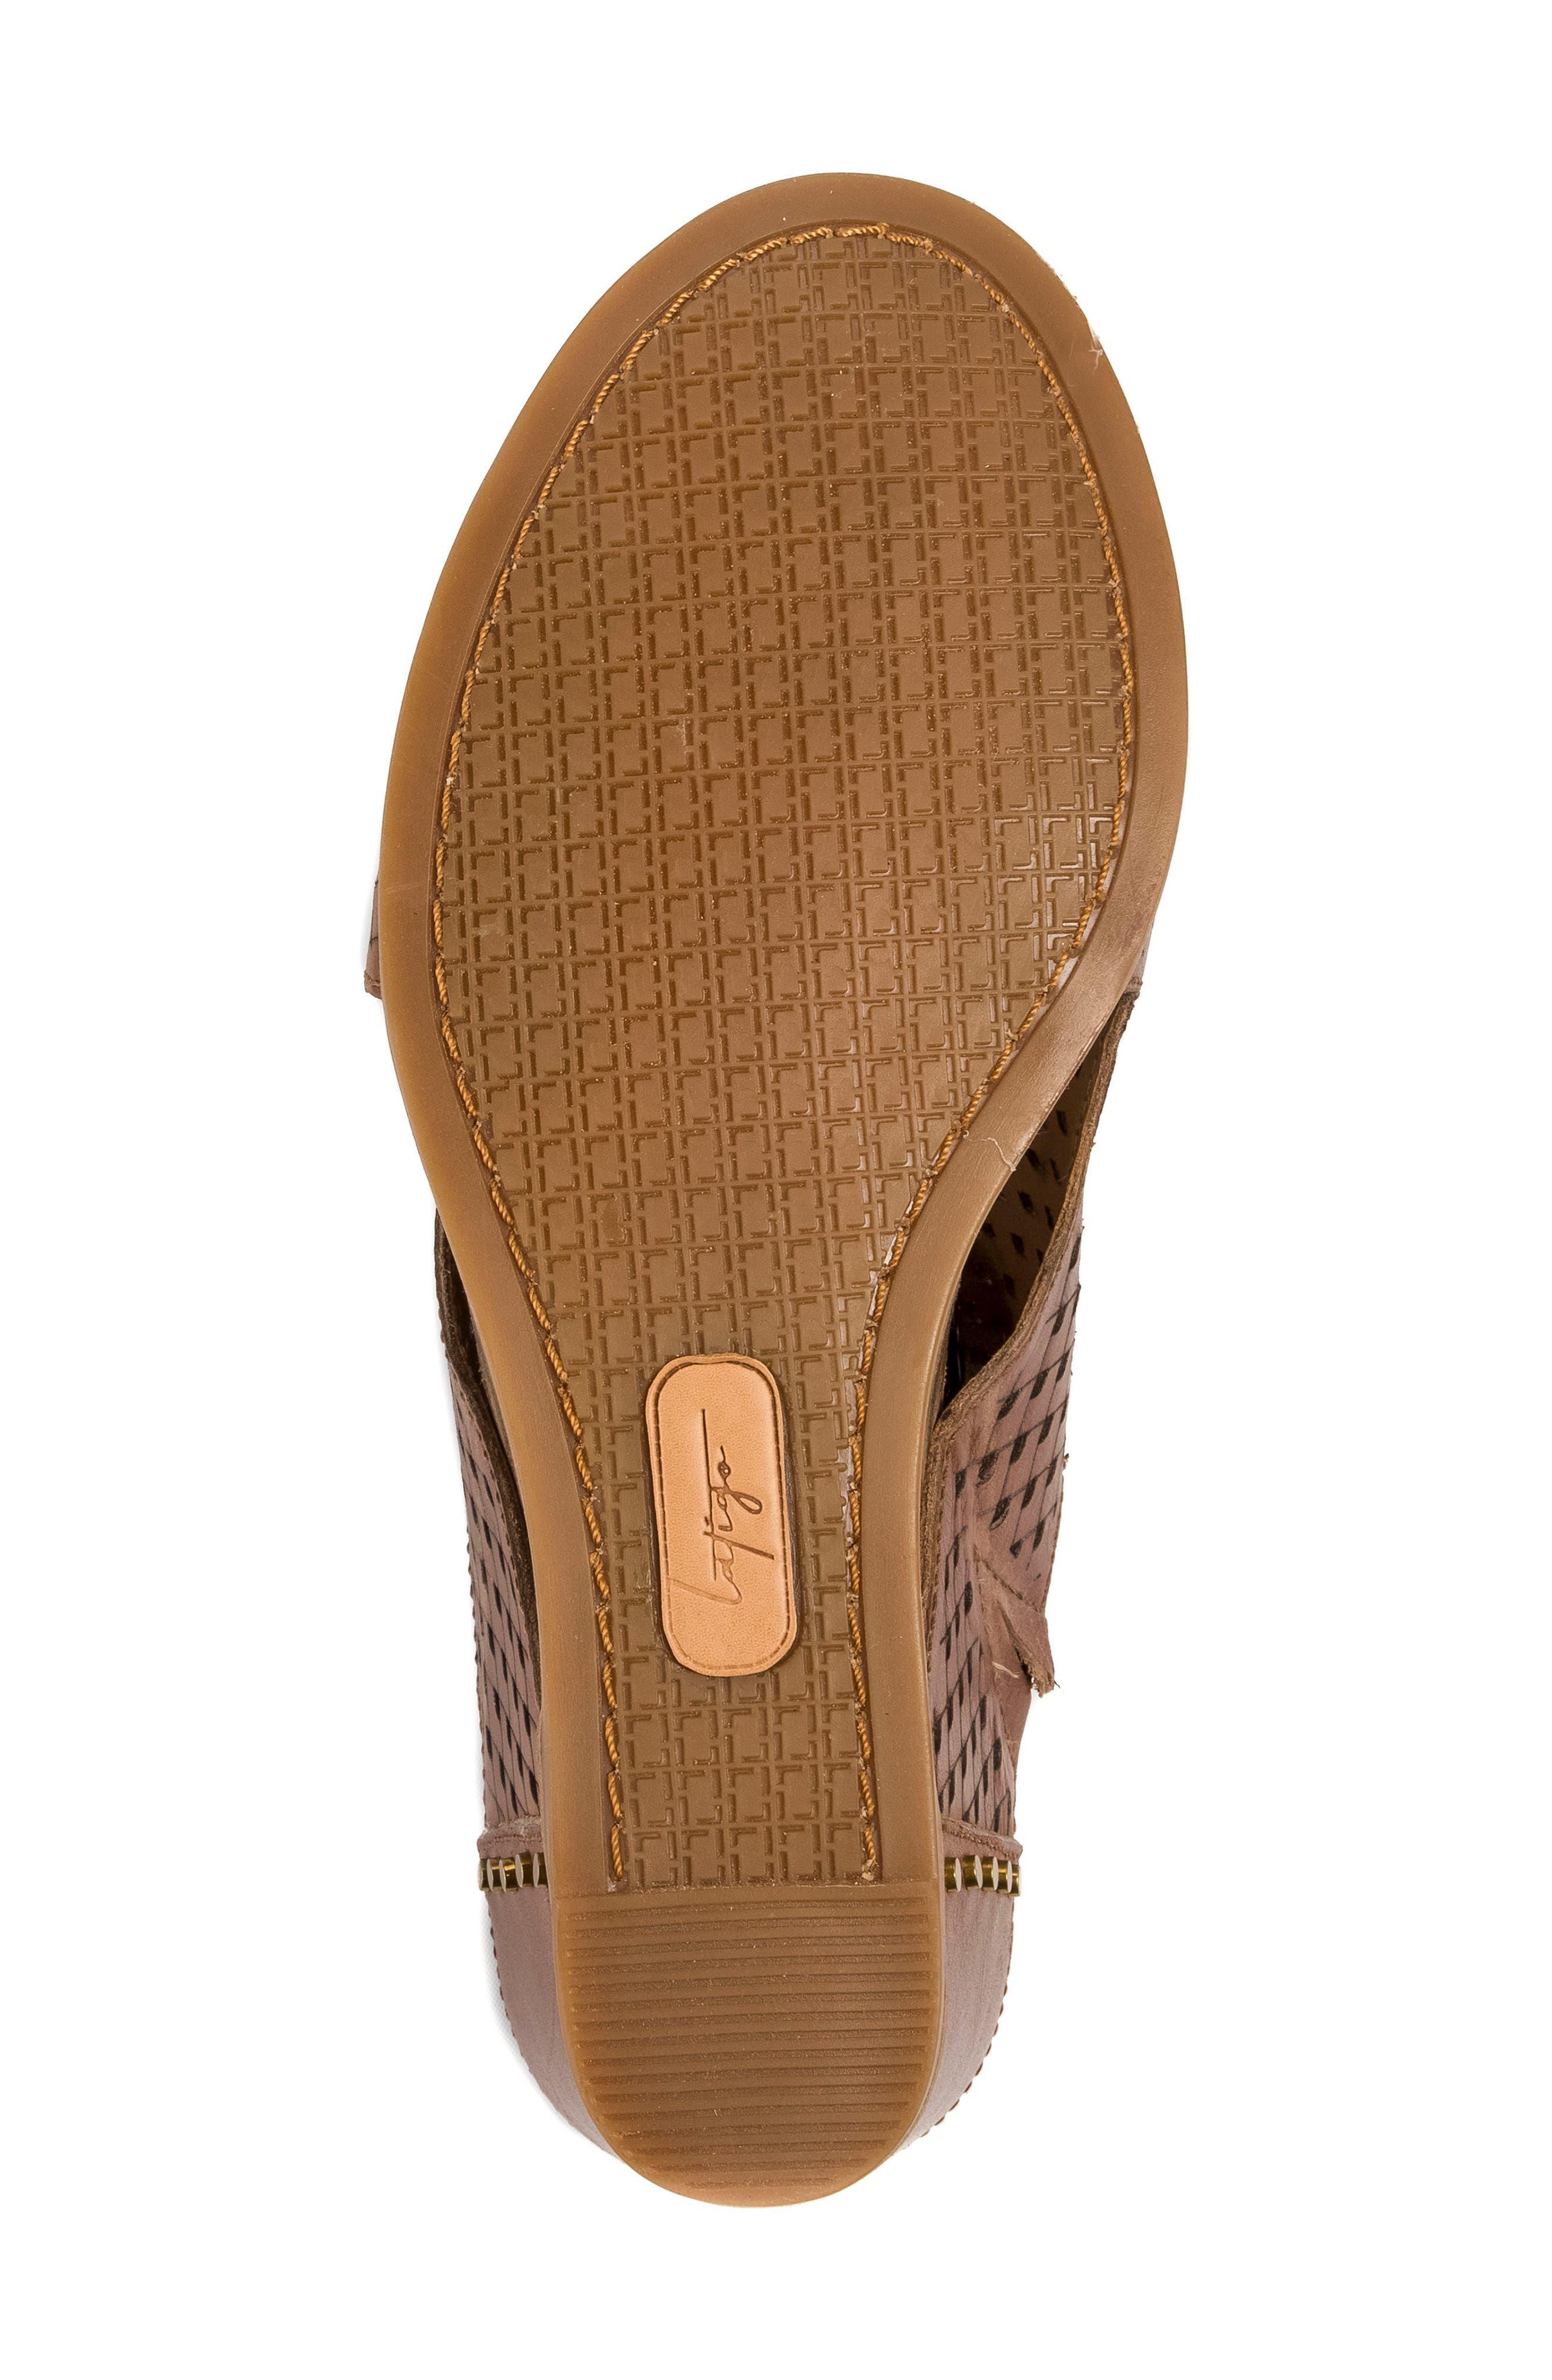 Janis Laser Cut Wedge Sandal,                             Alternate thumbnail 6, color,                             Brush Brown Leather